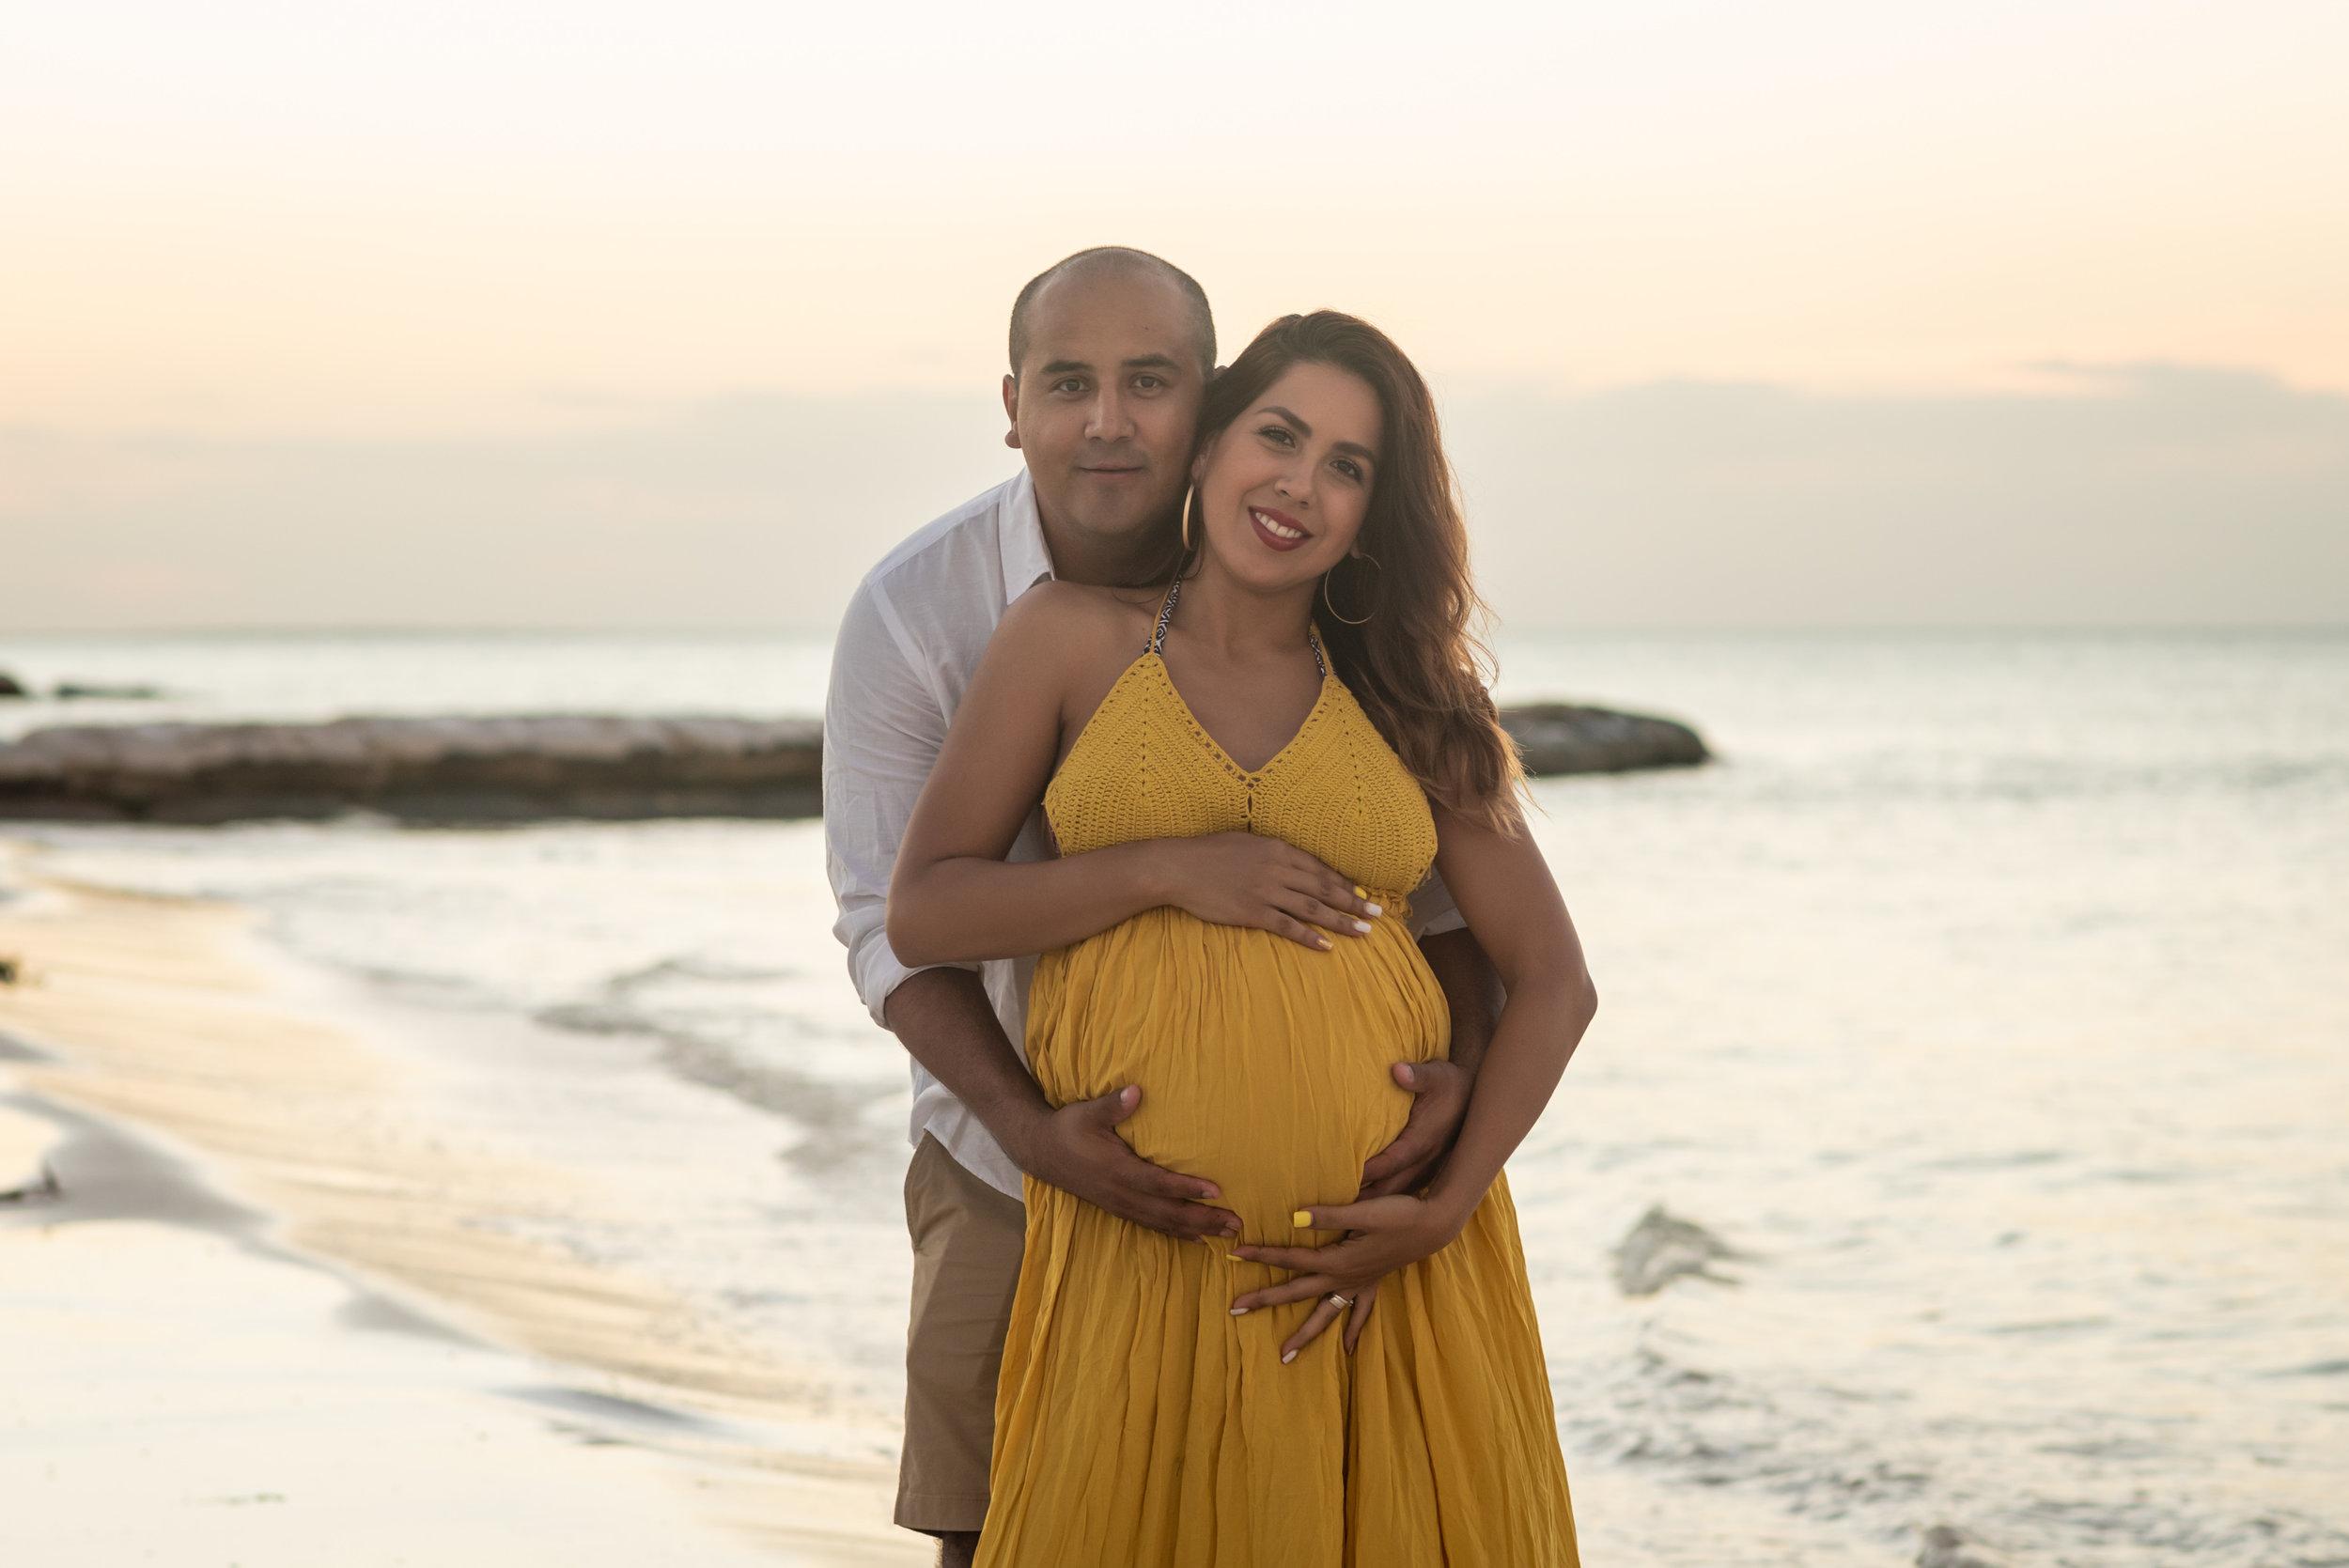 maternity photoshoot on beach location in holbox island